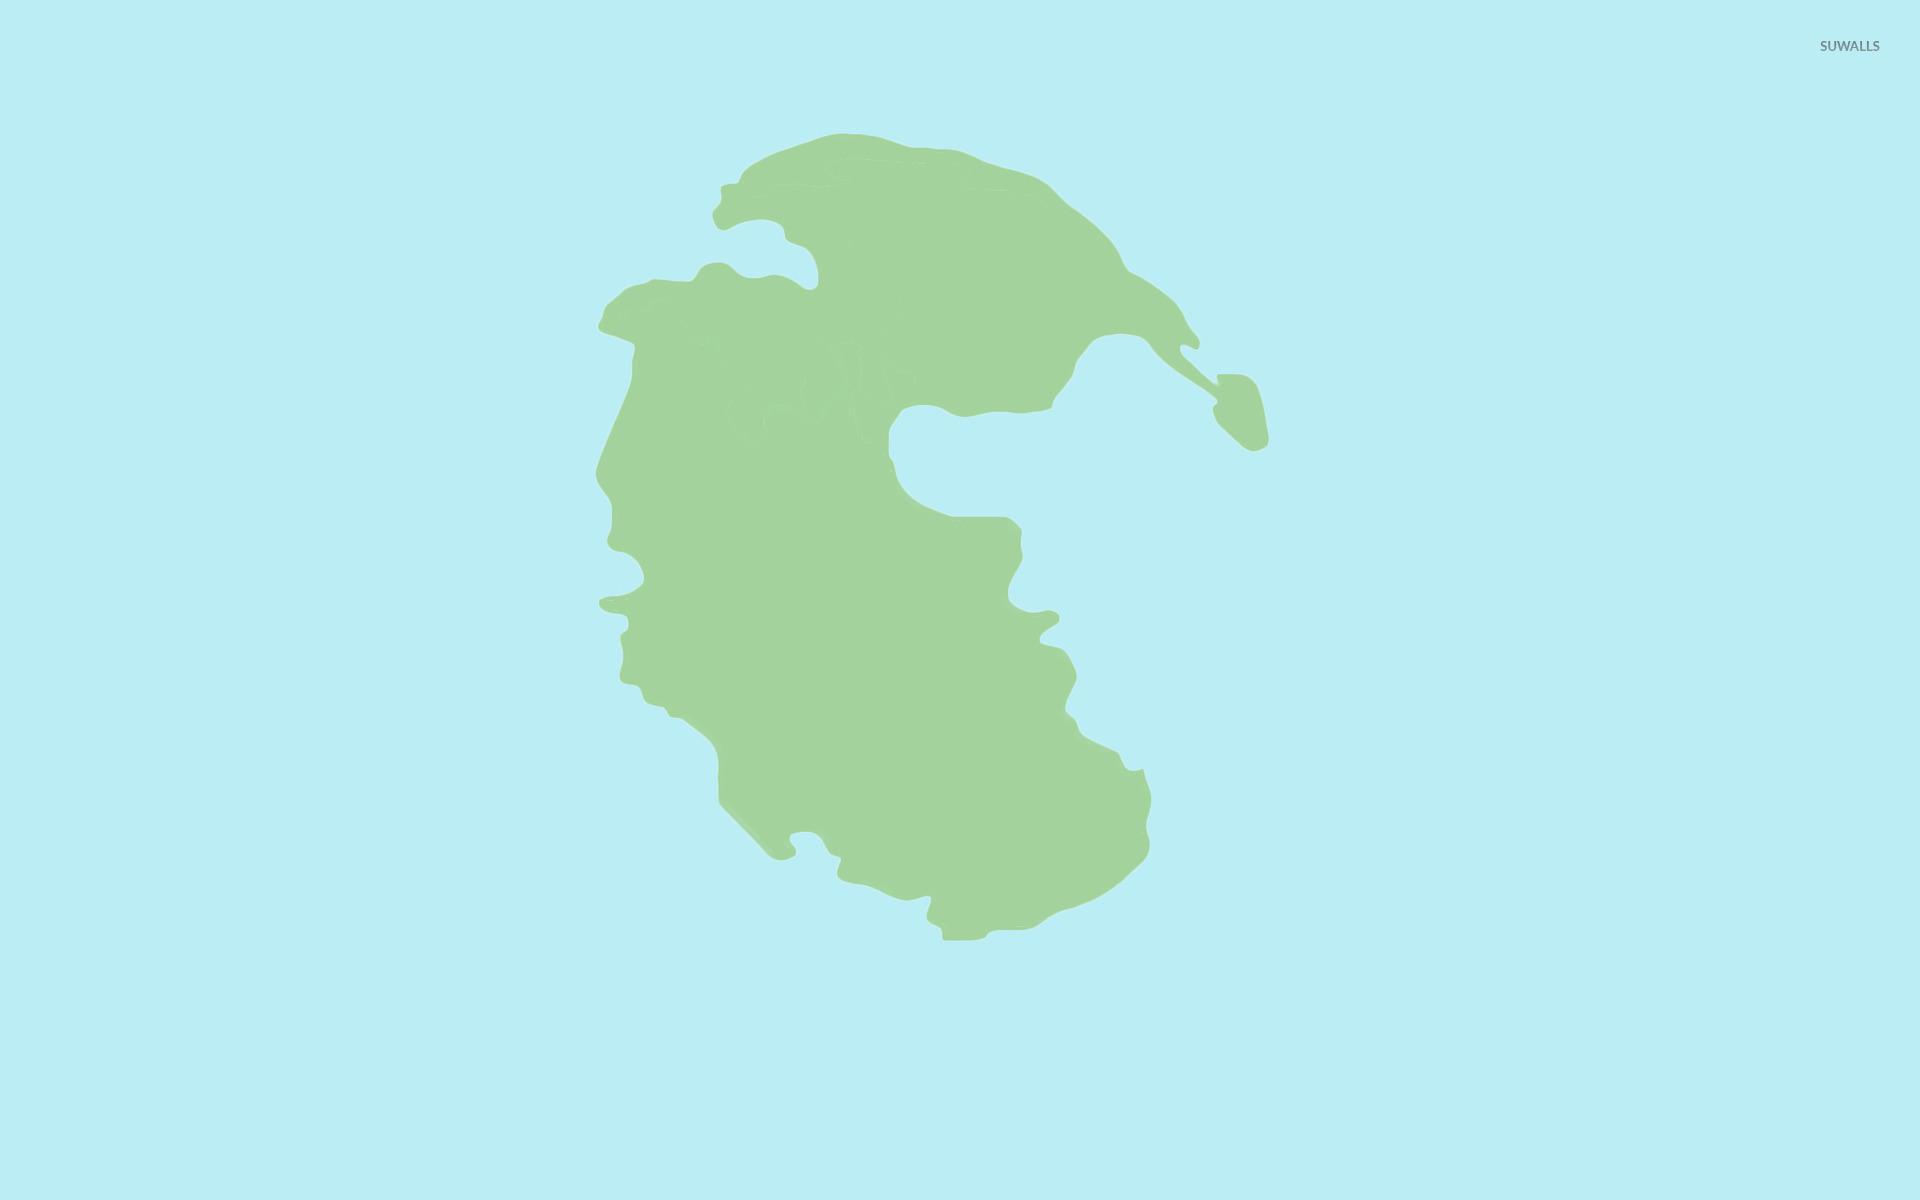 pangaea wallpaper - minimalistic wallpapers